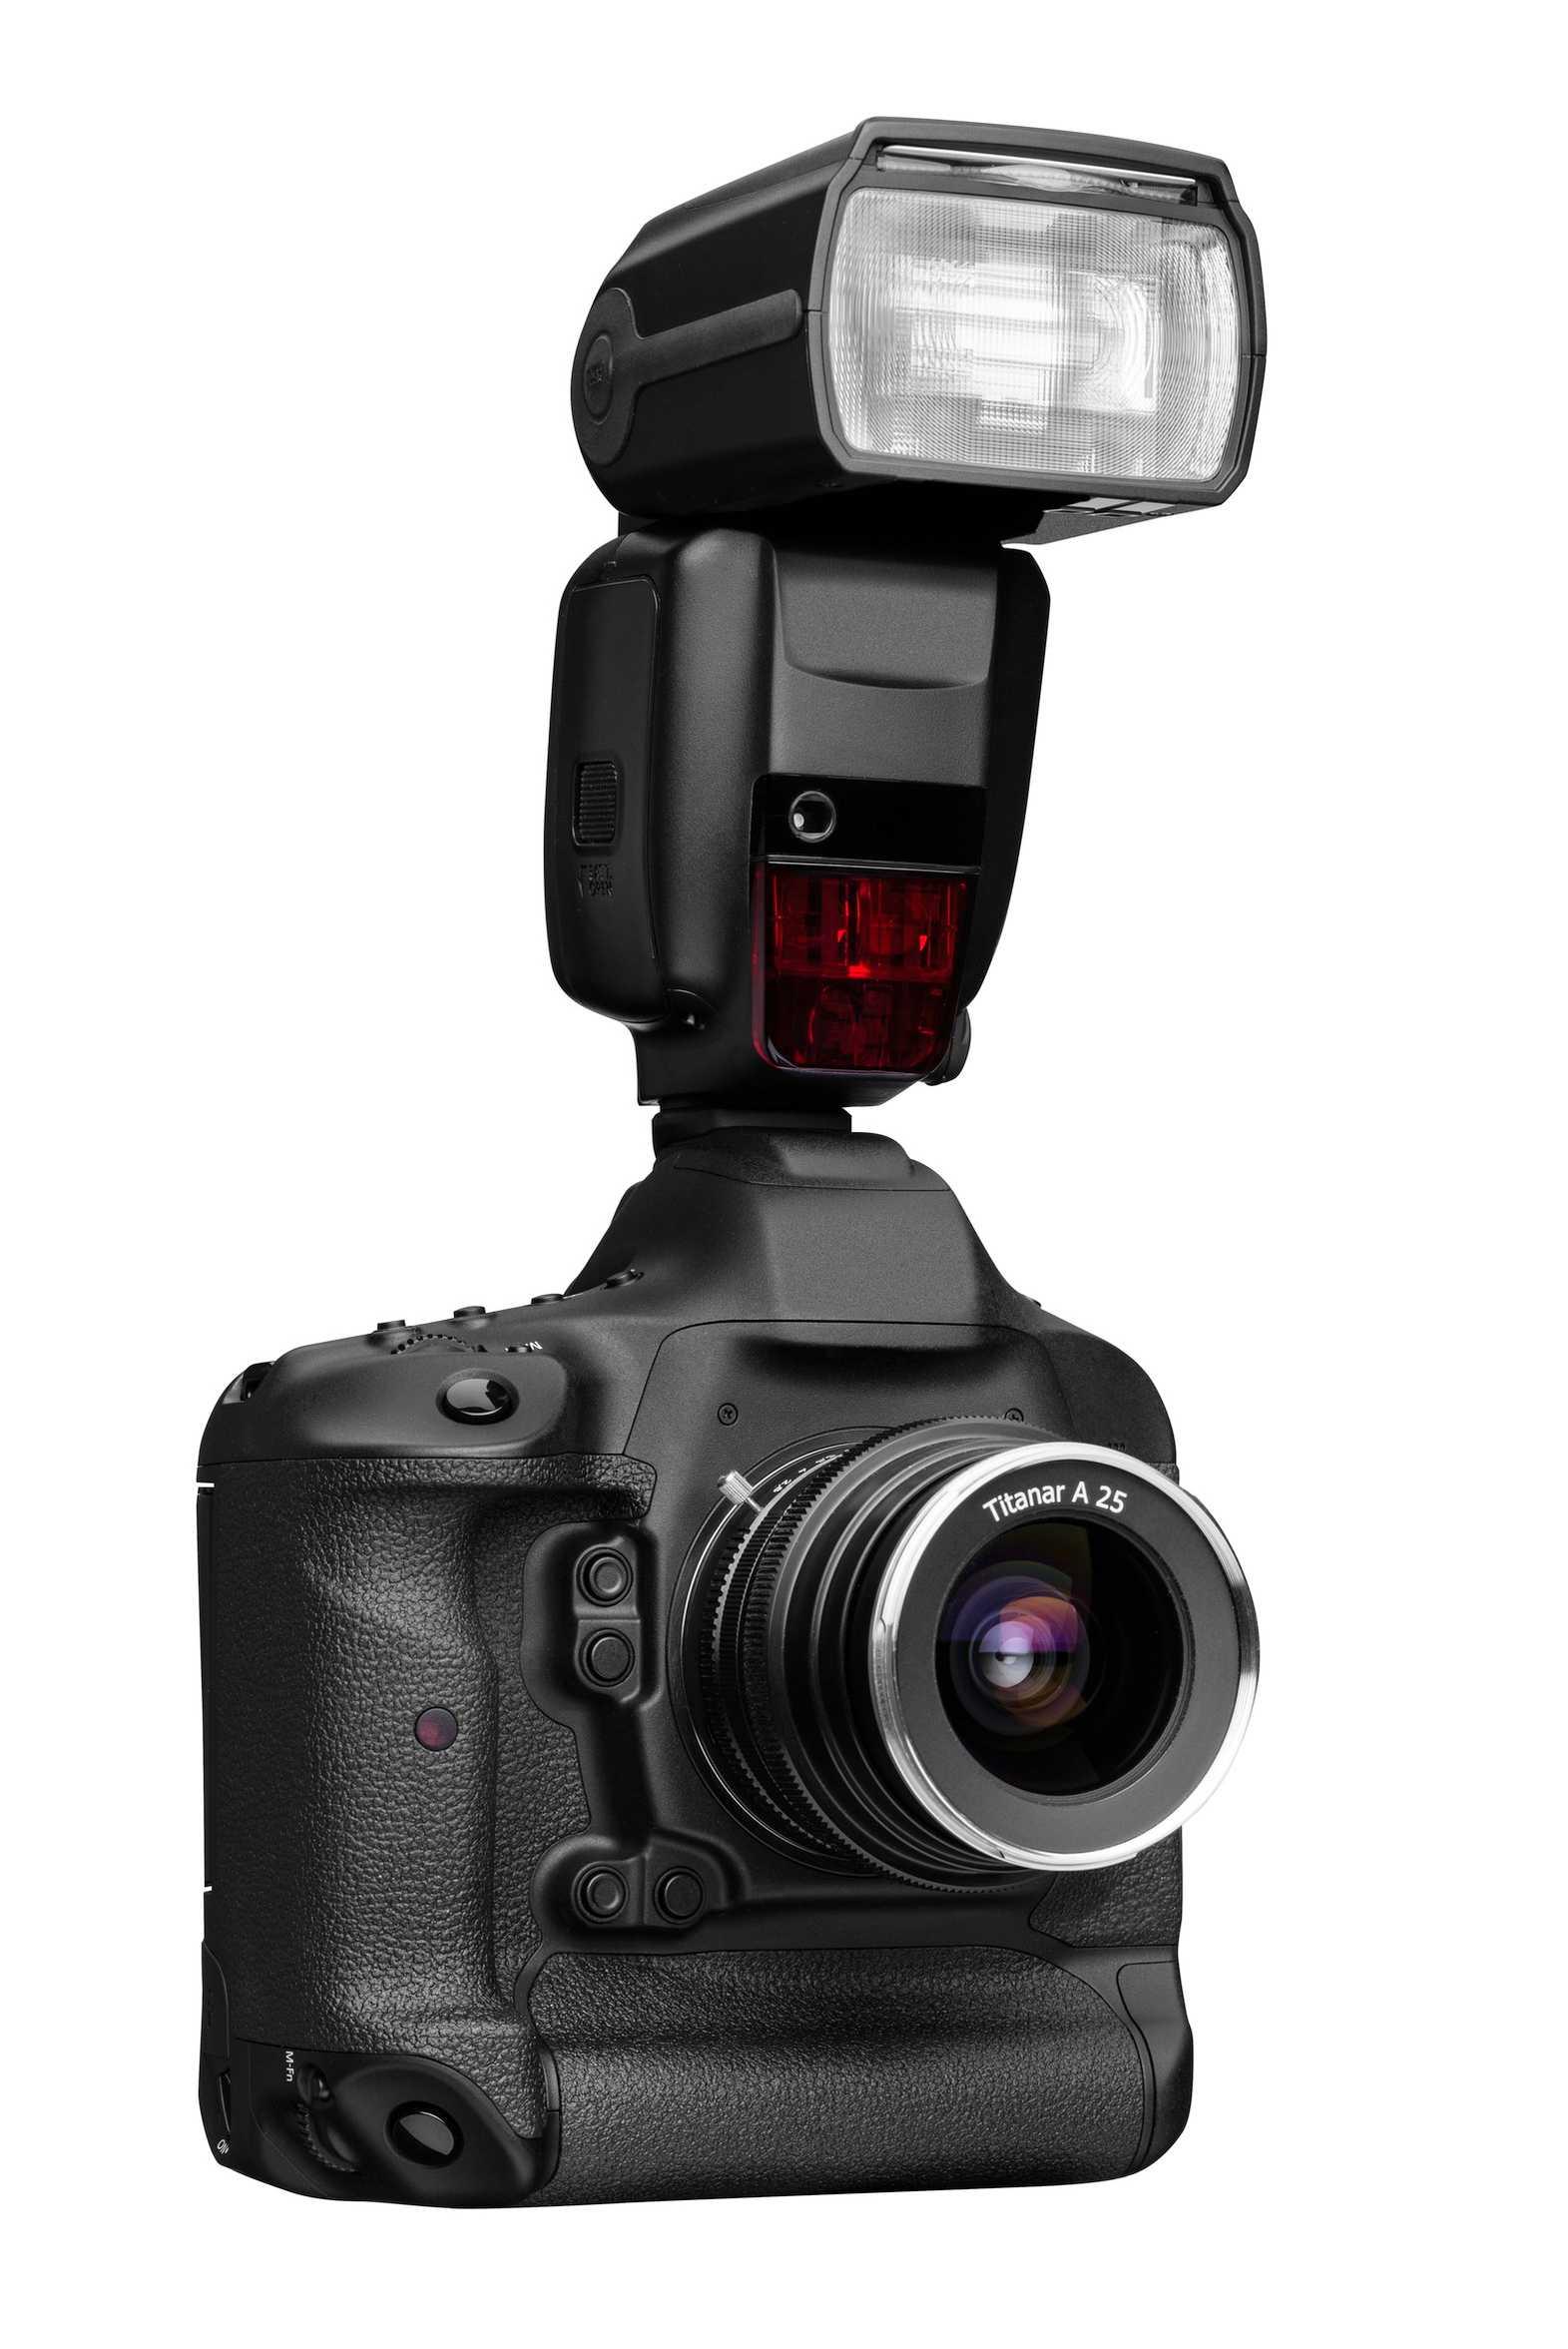 TRITOP camera